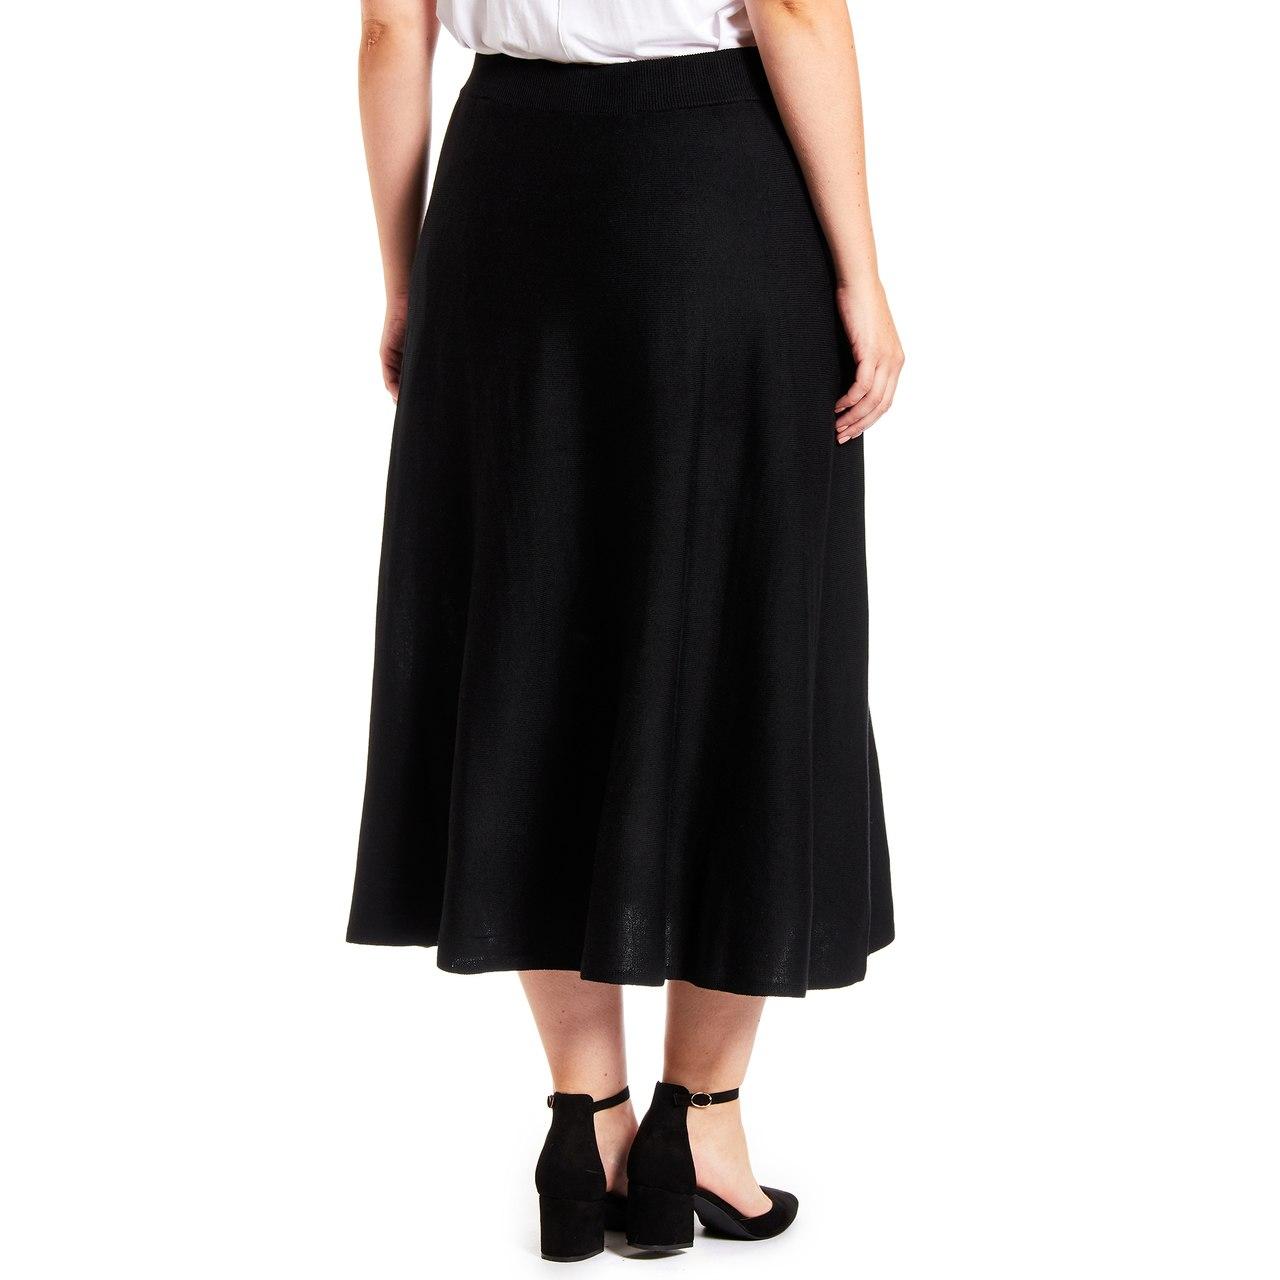 Curvy Boot Cut Sweater Skirt in Black